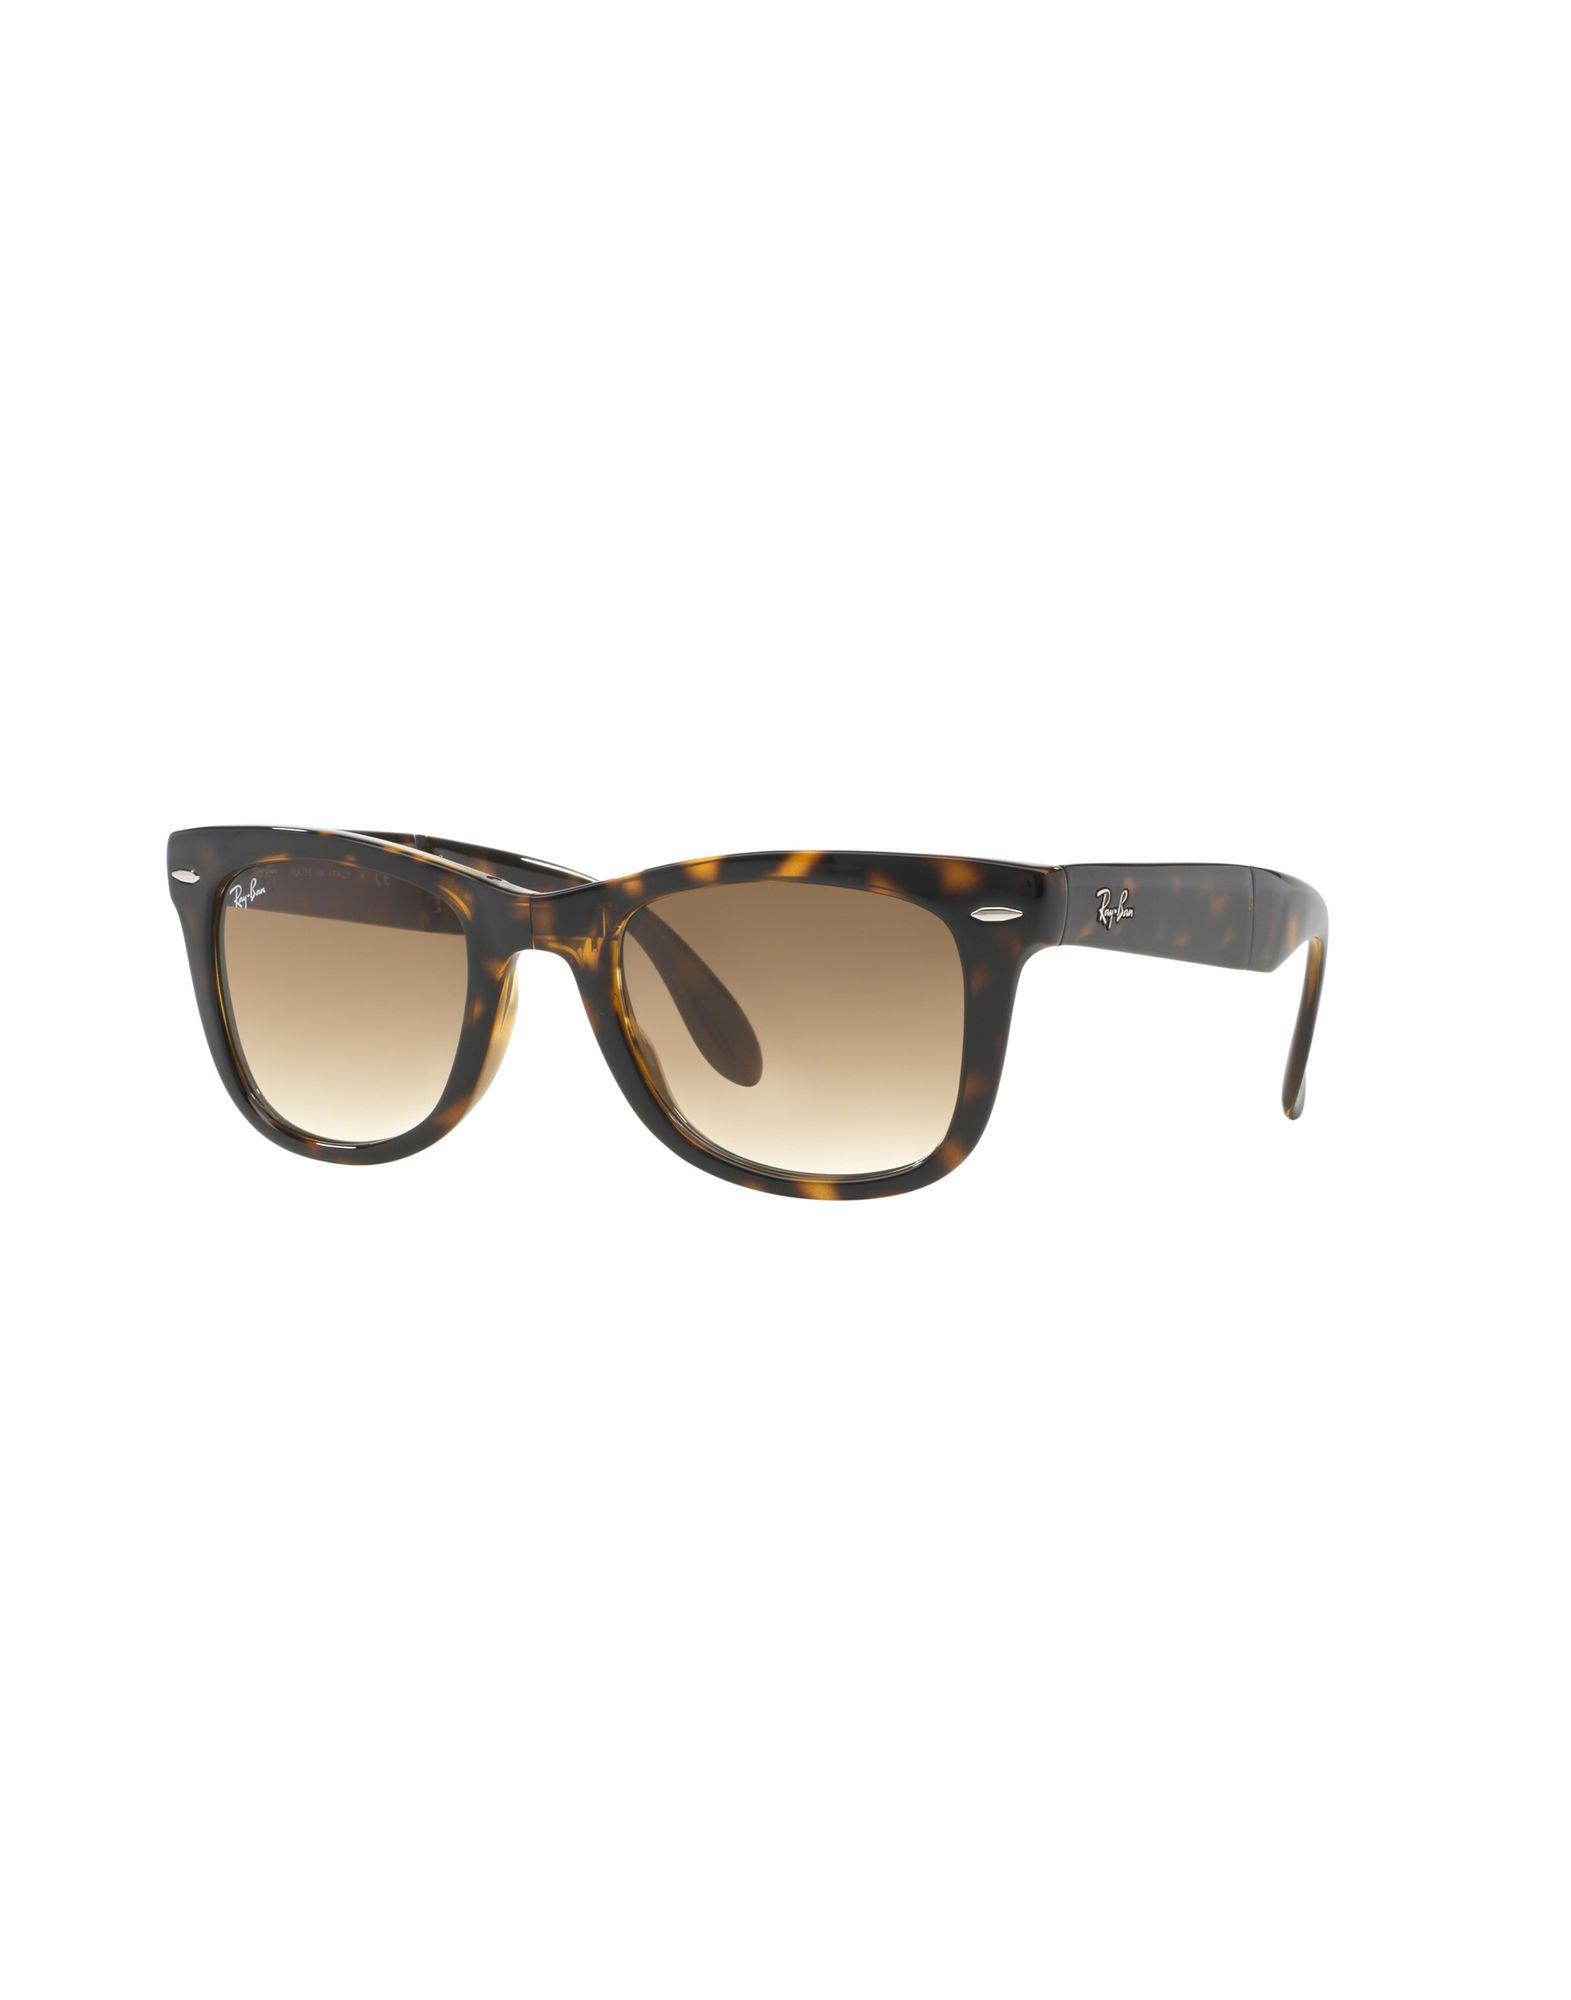 Occhiali Da Sole Ray-Ban Rb4105 Folding Wayfarer - Uomo - Acquista online su